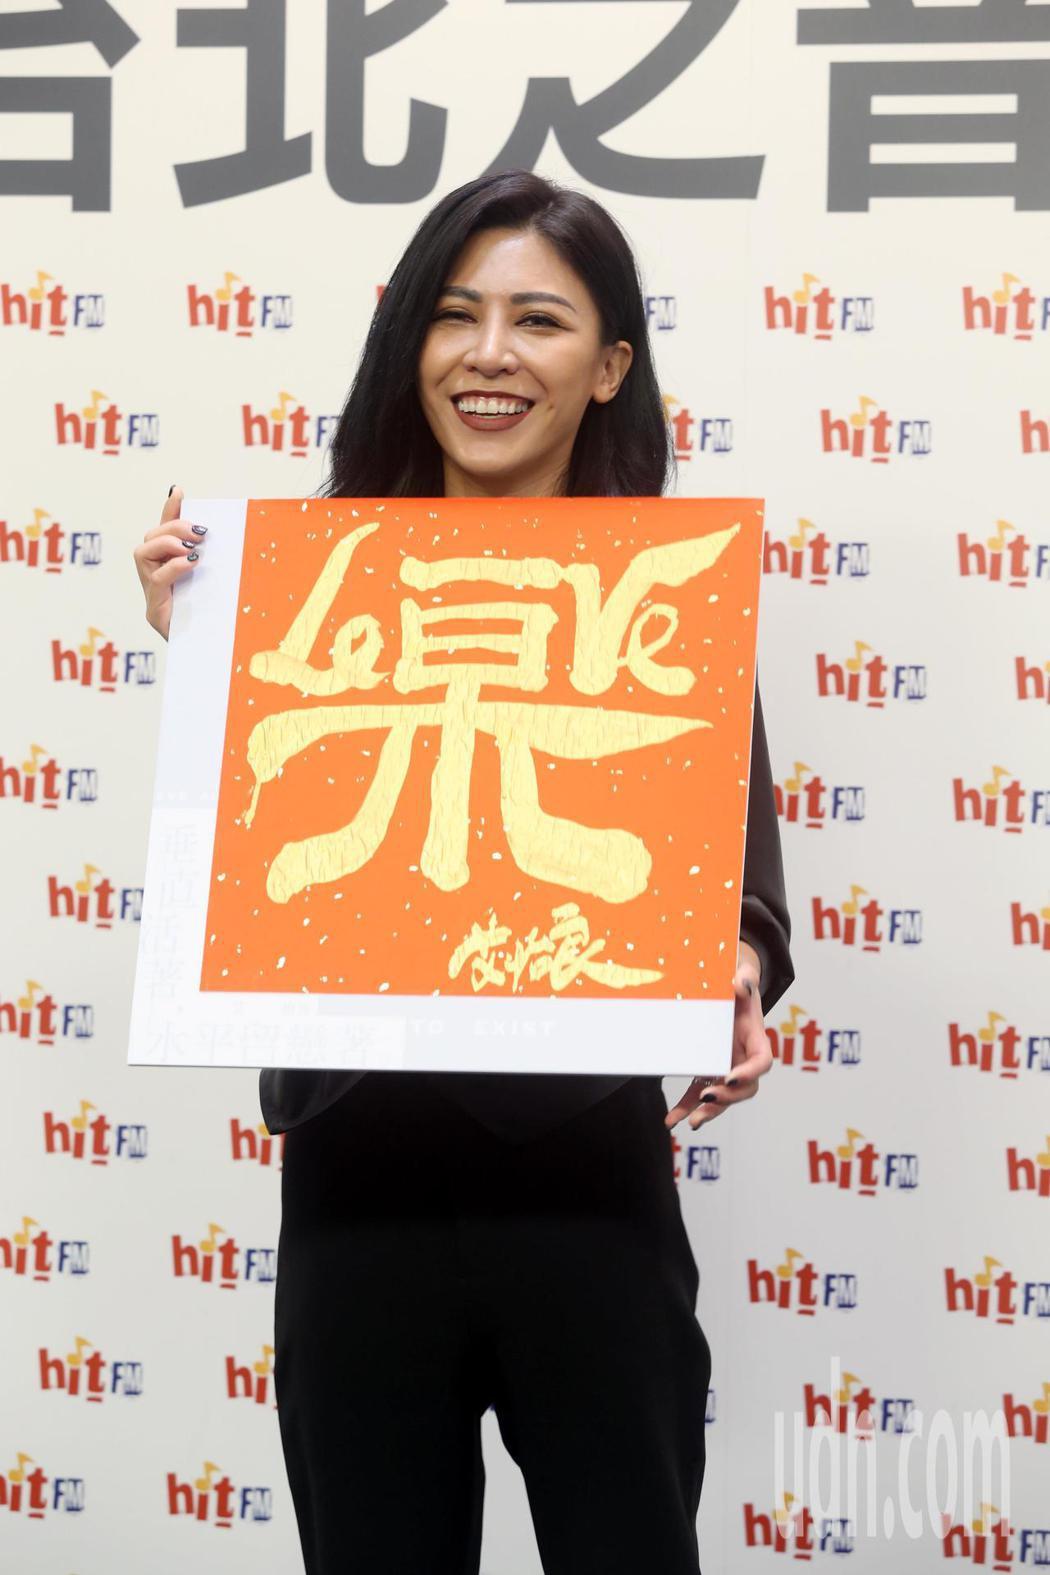 Hit Fm聯播網1月「hito最大ㄎㄚ」活動,今天邀請睽違兩年將交出新作的艾怡...